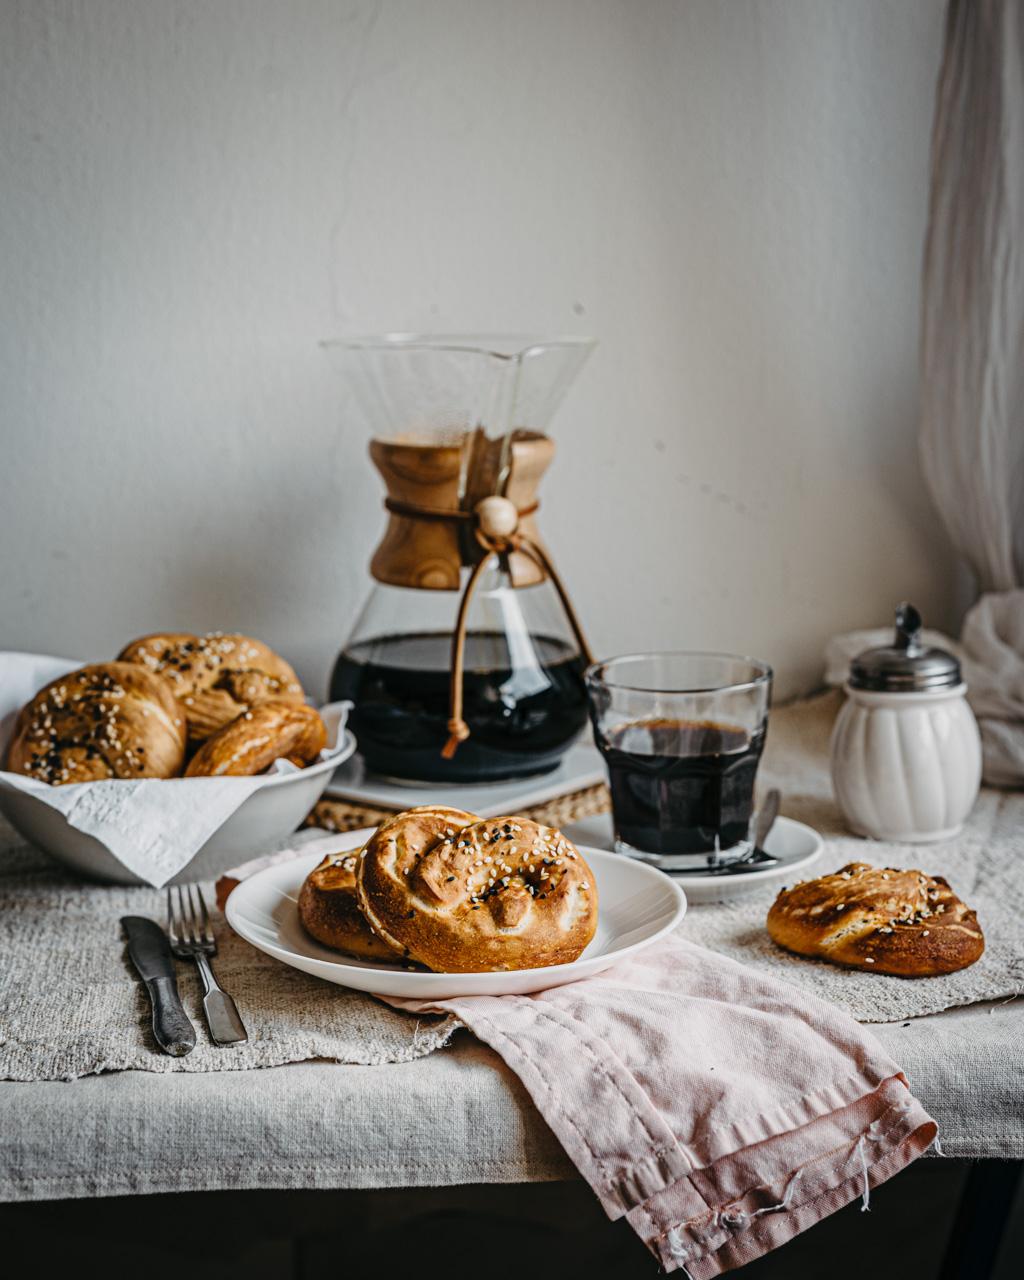 Chemex coffee and pretzels